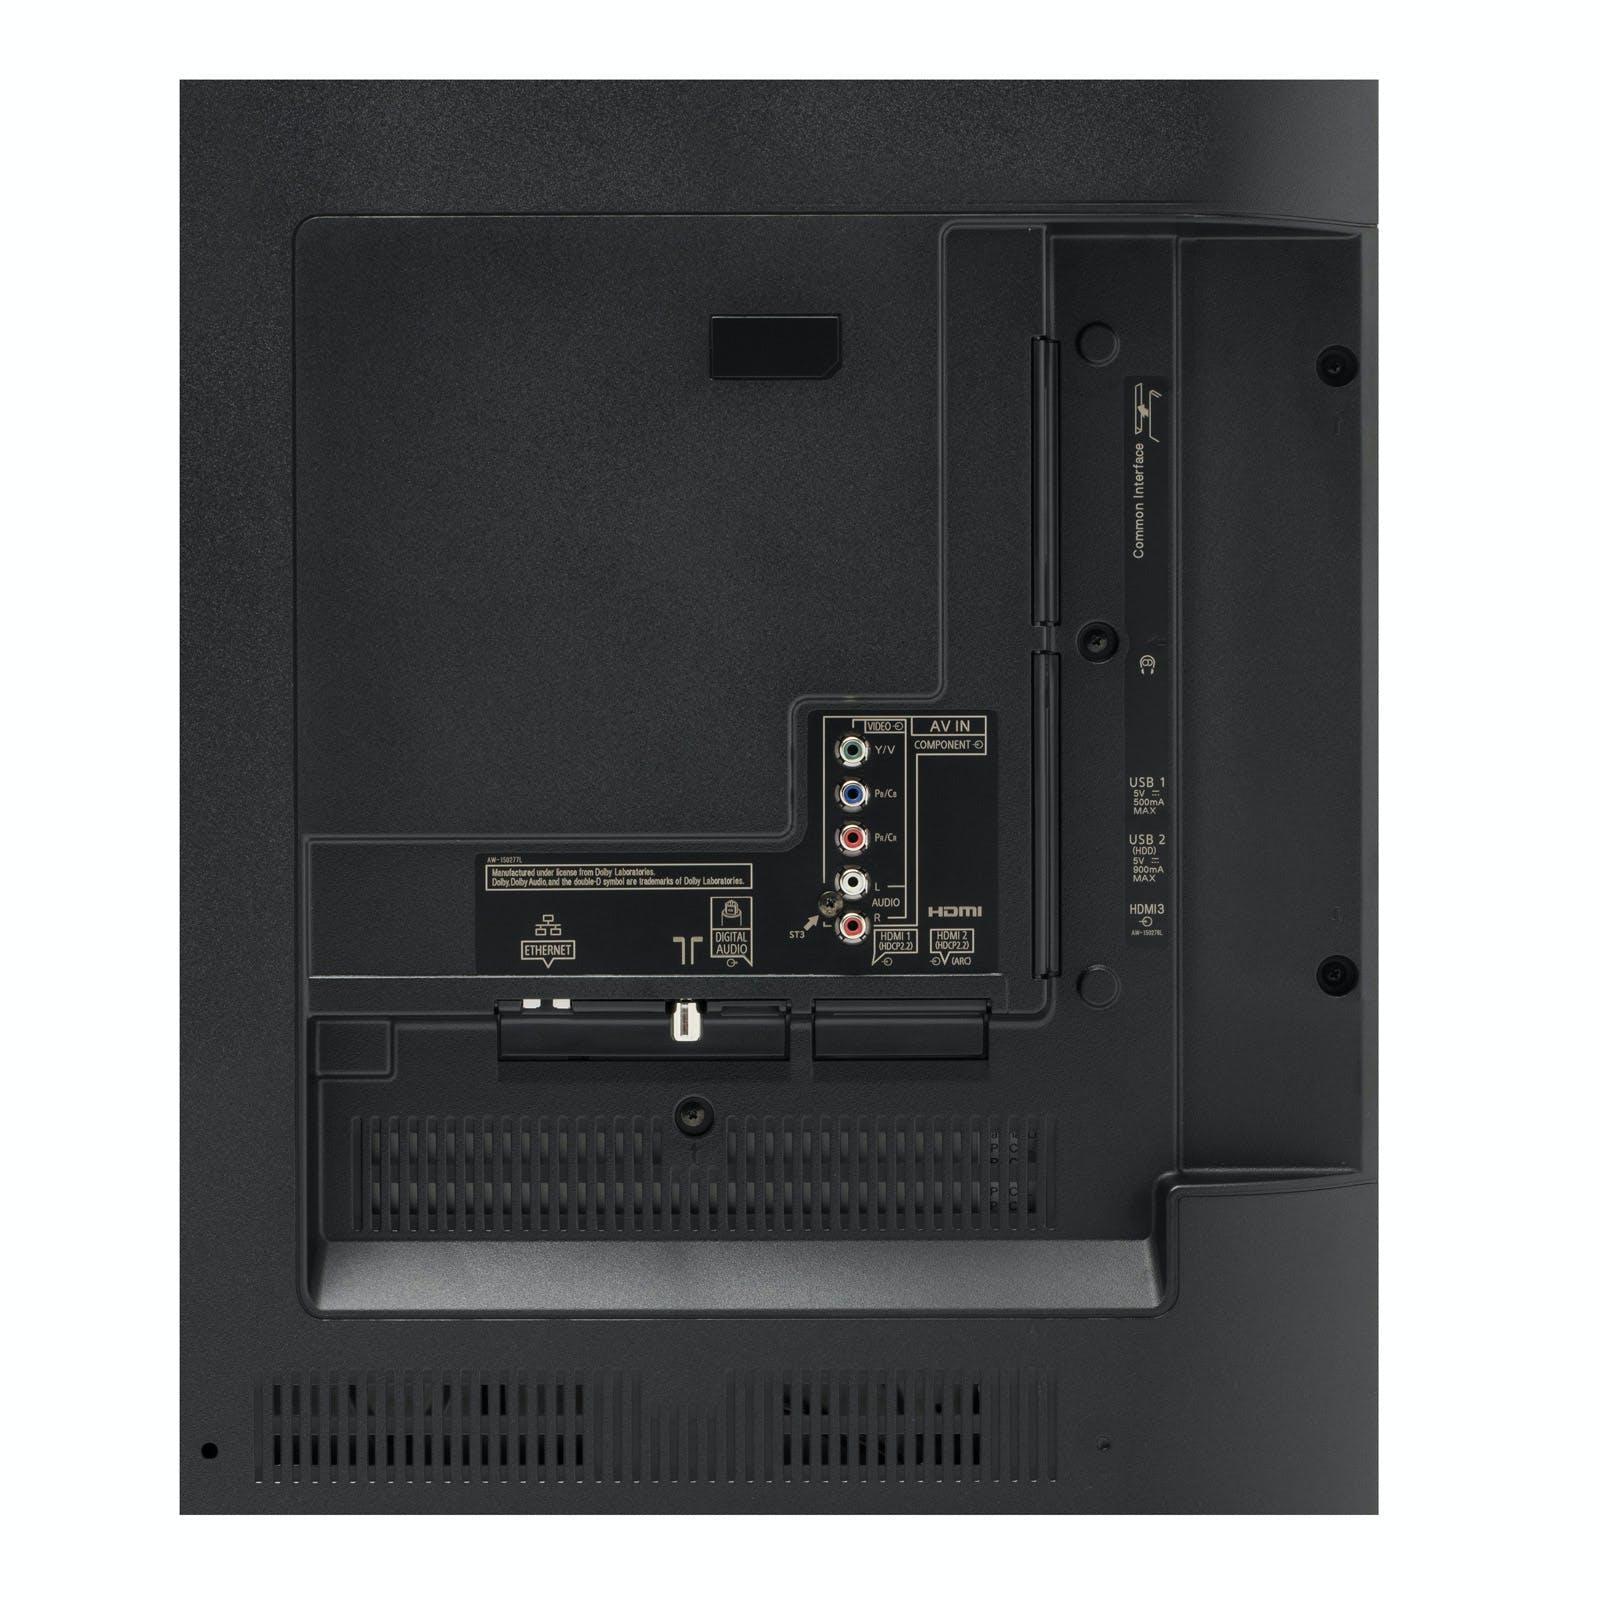 Panasonic TX49DX600B 49 4K Ultra HD Smart LED TV 800Hz